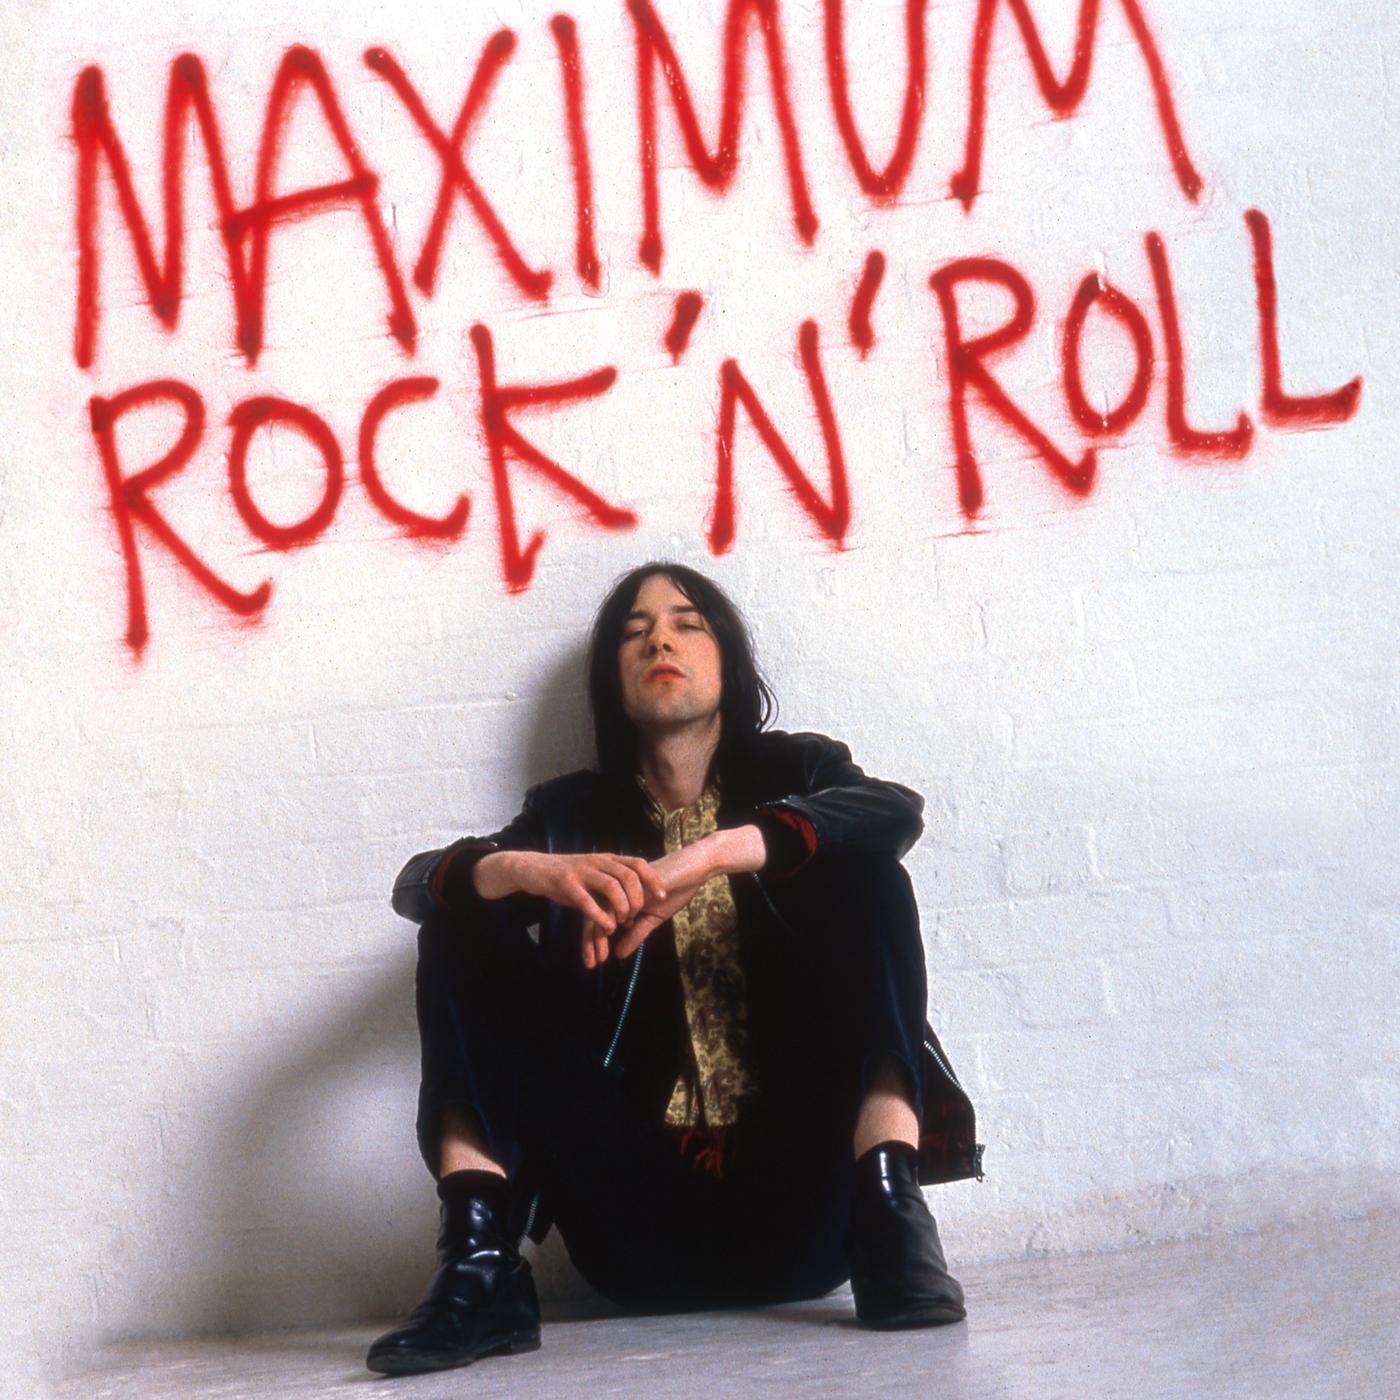 Maximum Rock 'n' Roll: The Singles (Remastered) - Primal Scream